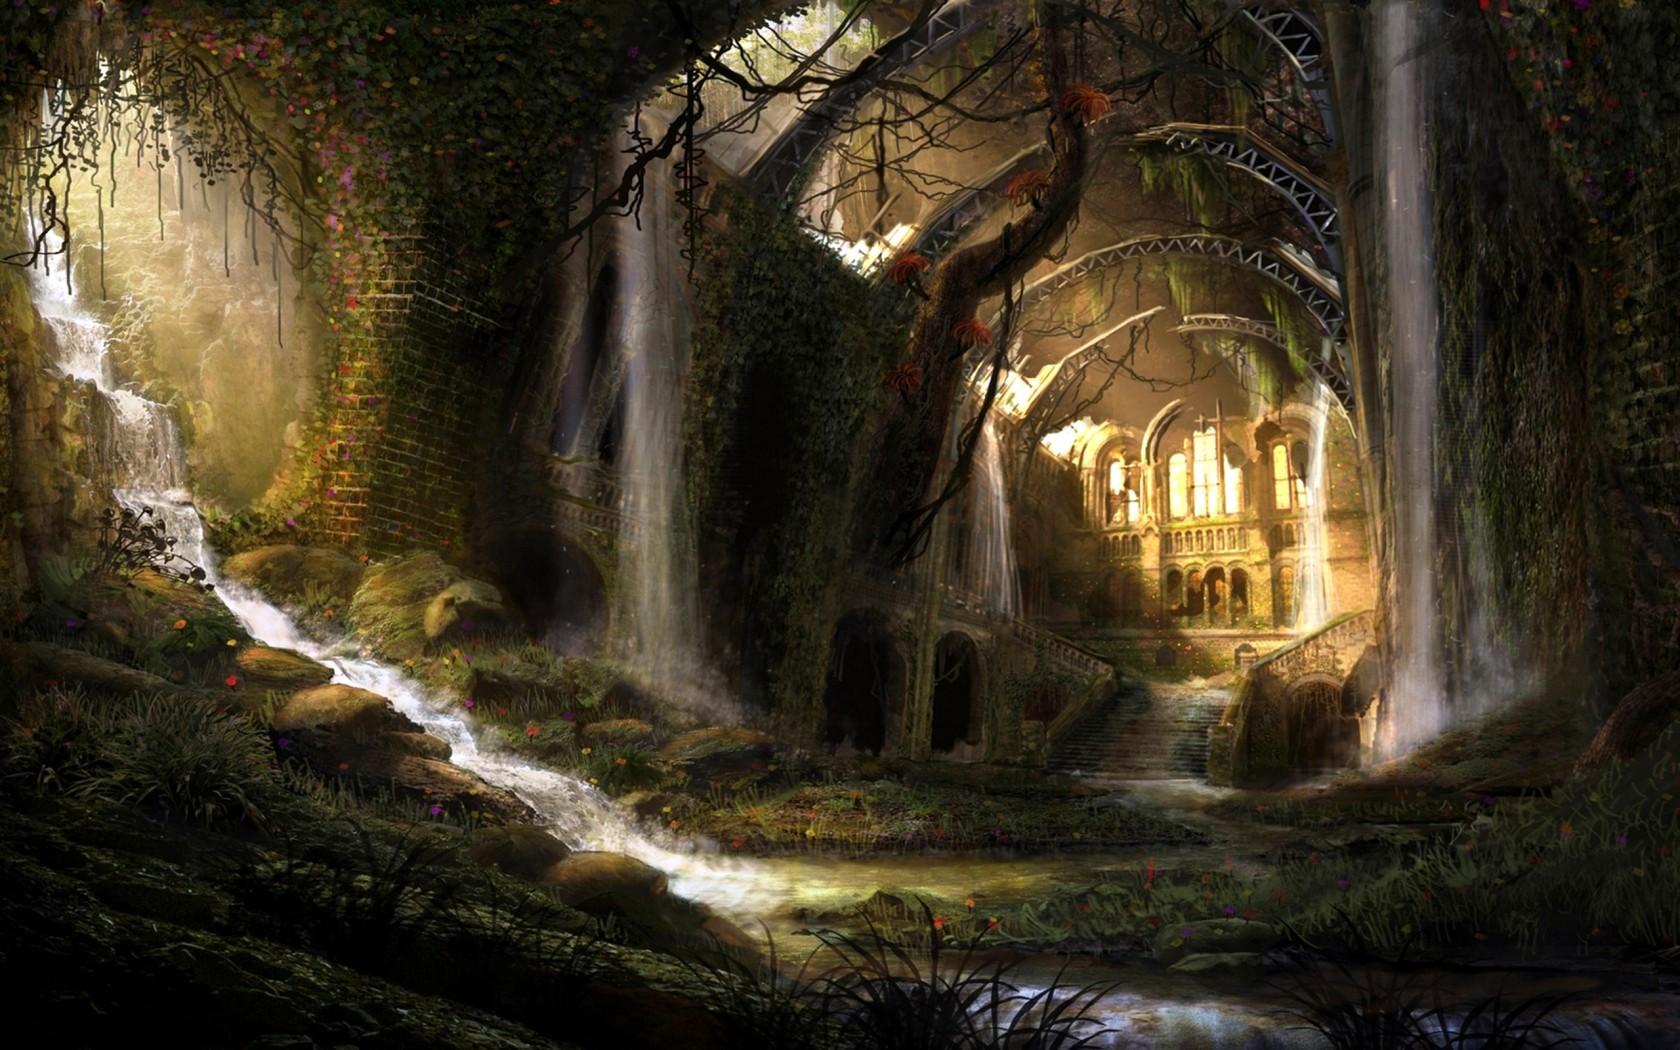 Fantasy World Underground widescreen wallpaper | Wide-Wallpapers NET